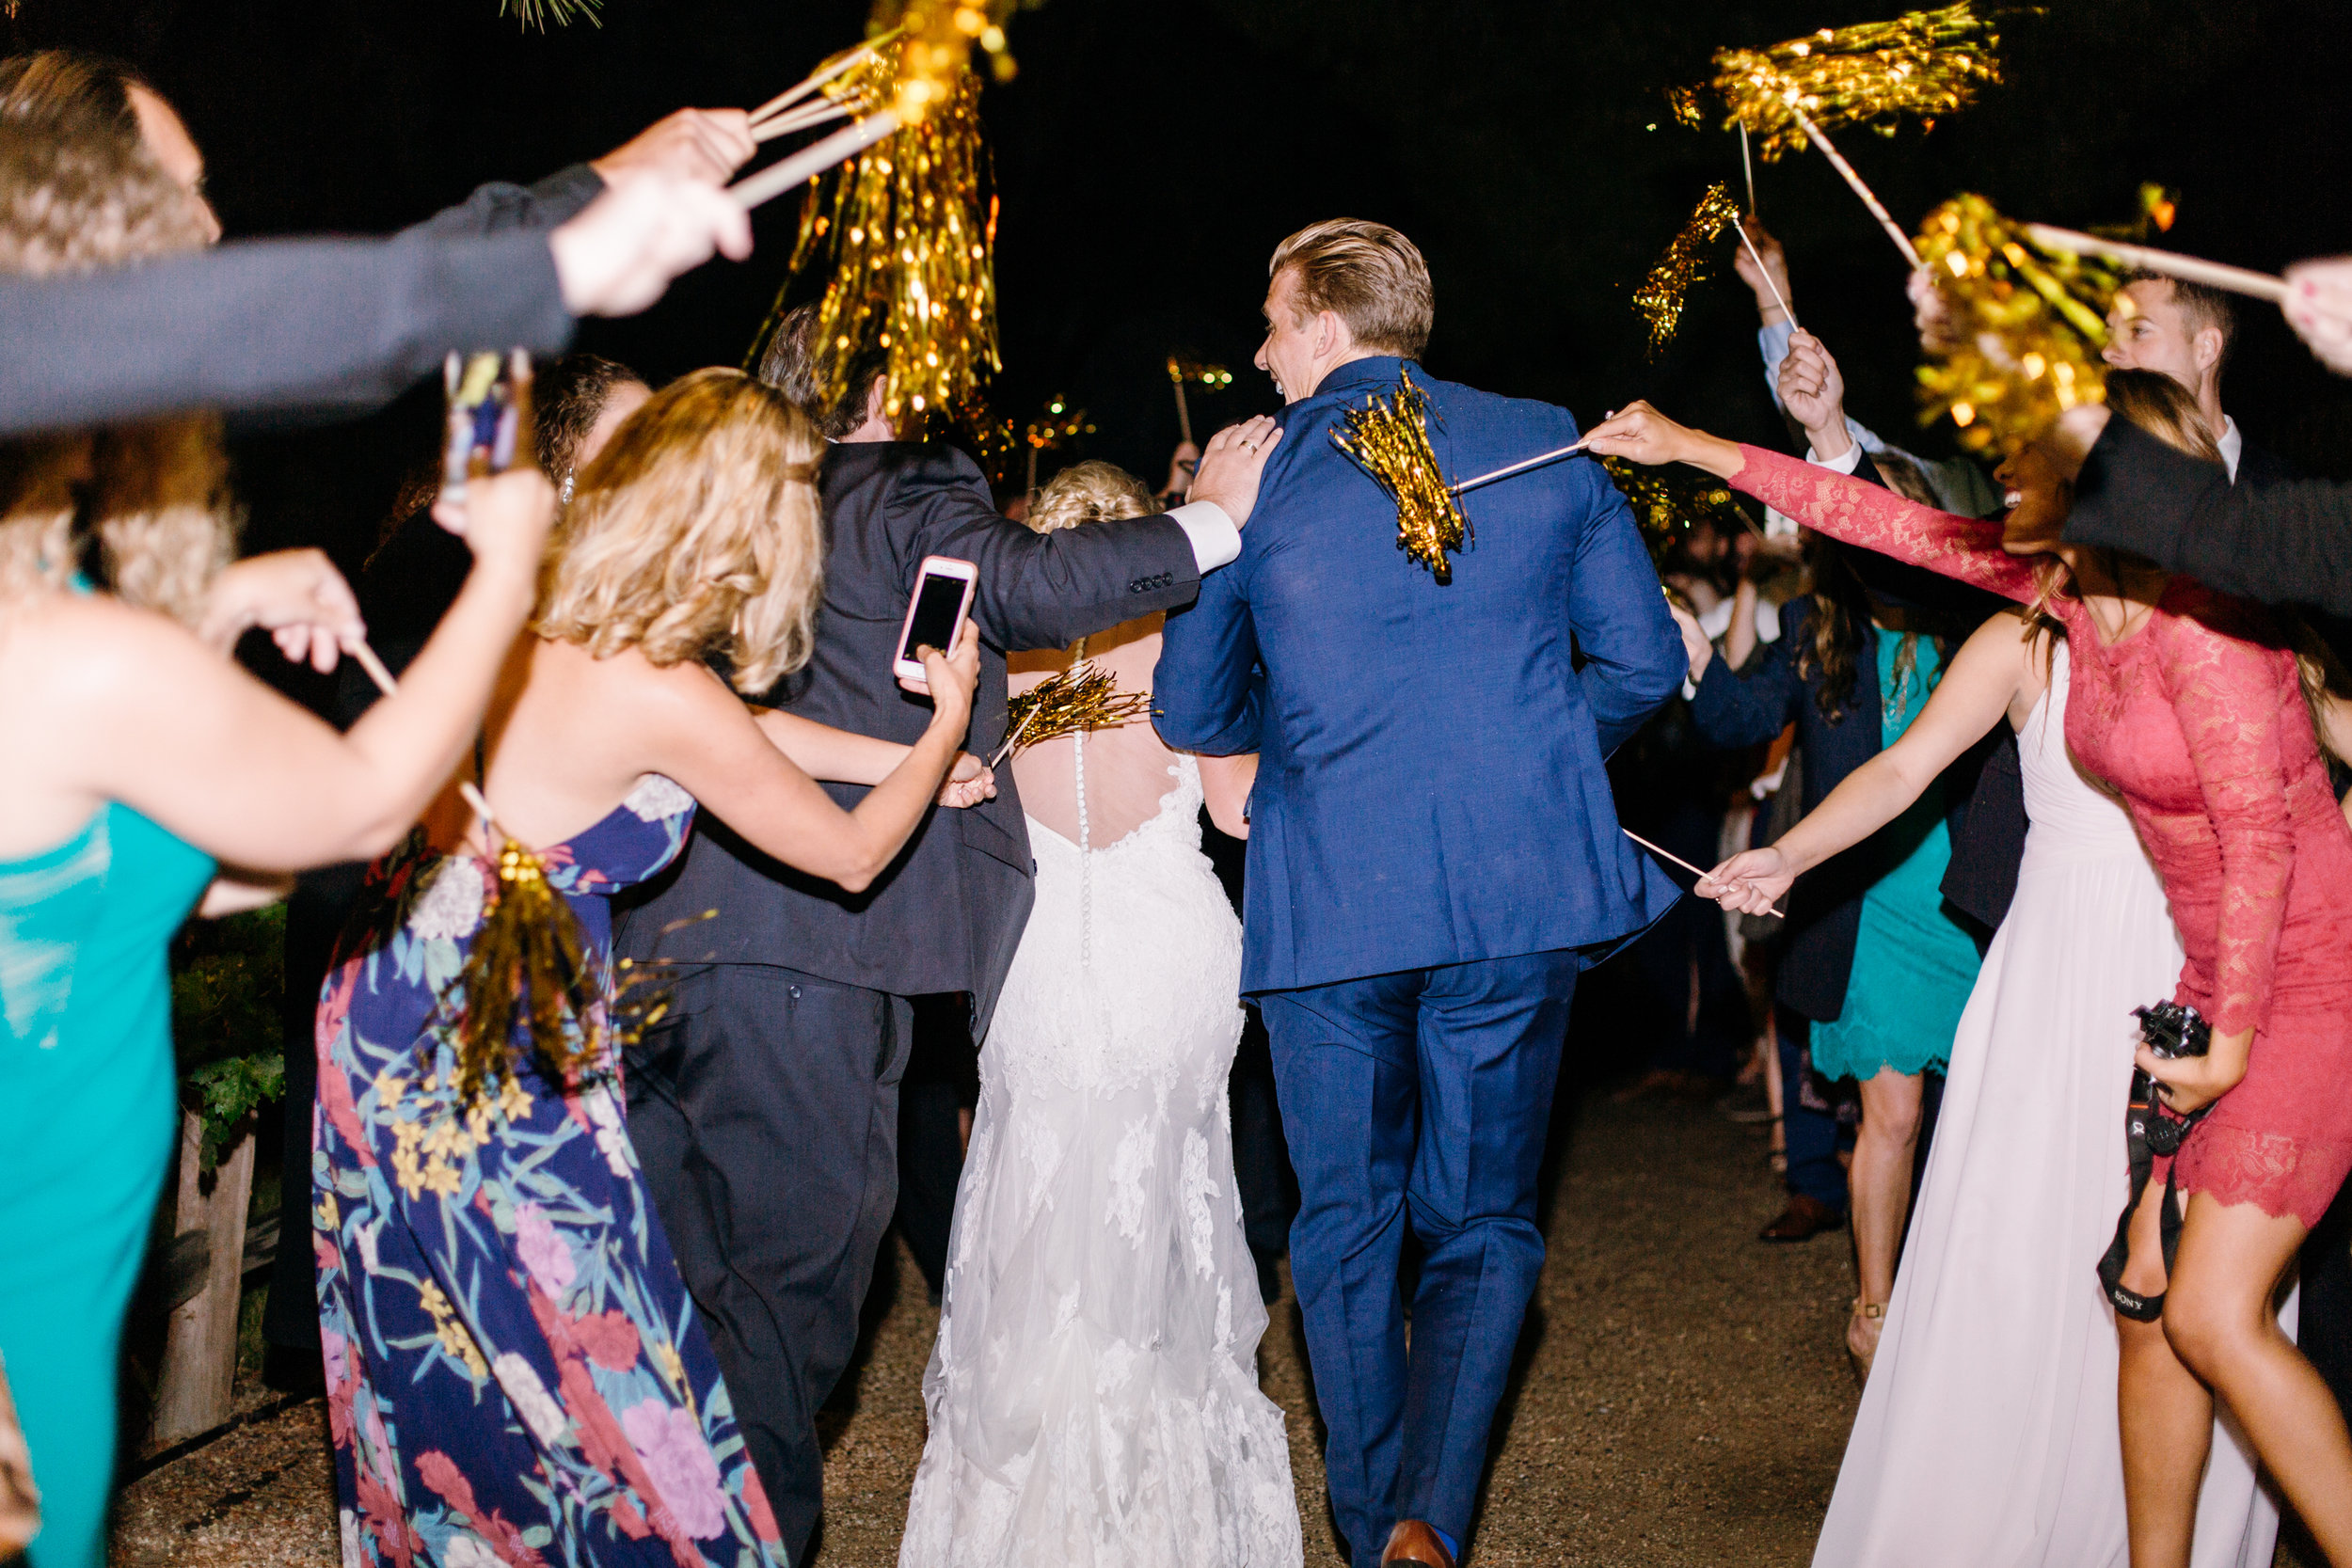 KaraNixonWeddings-LakeOakMeadows-Temecula-Wedding-59.jpg